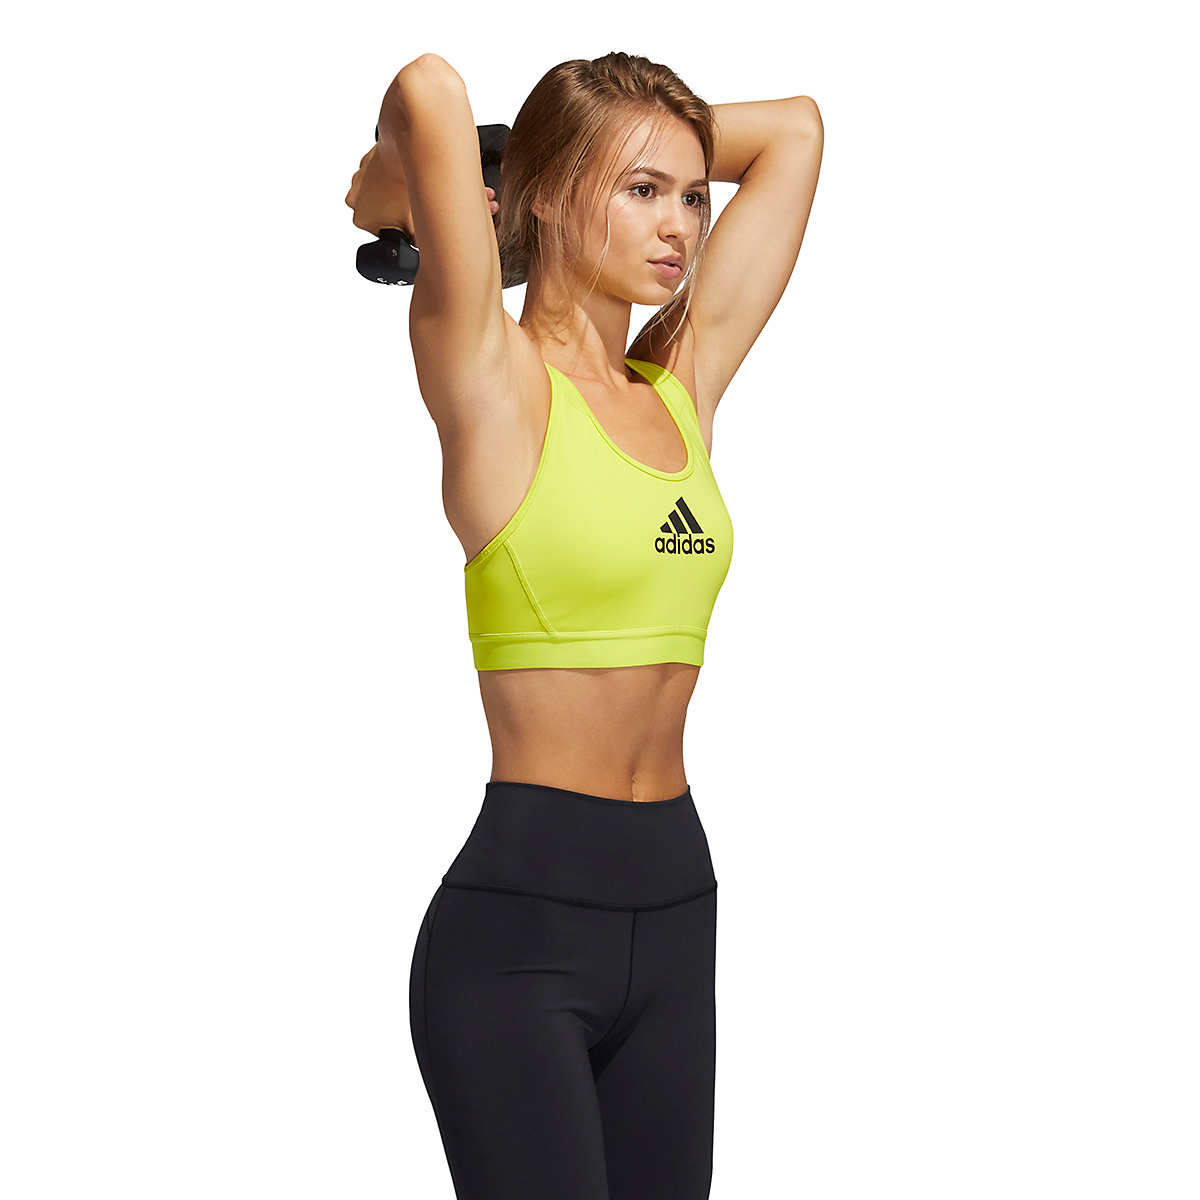 Women's Adidas Don't Rest Alphaskin Bra - Color: Acid Yellow - Size: XXS, Acid Yellow, large, image 3